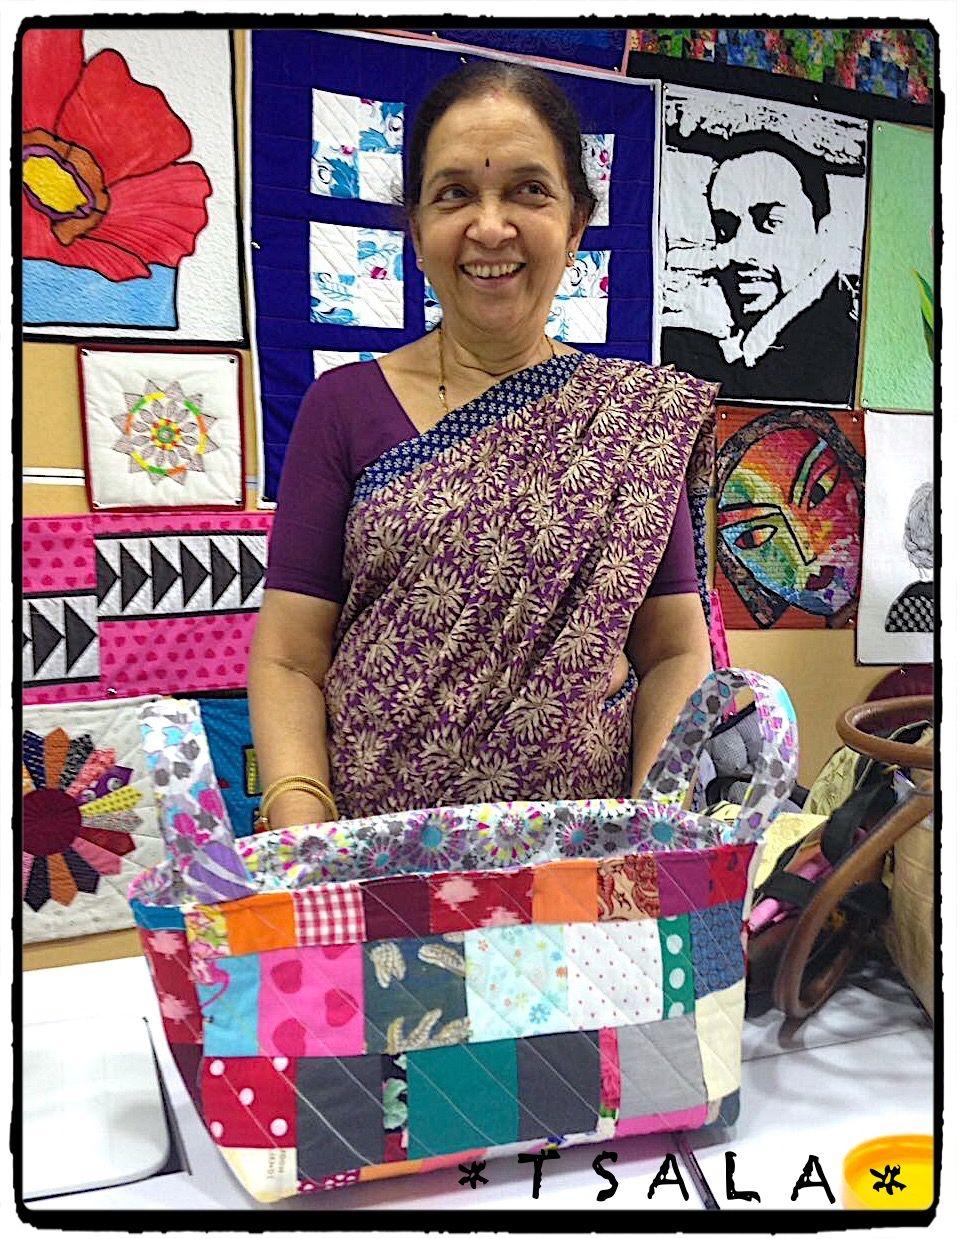 Hobby classes in bangalore at tsala quilting studio